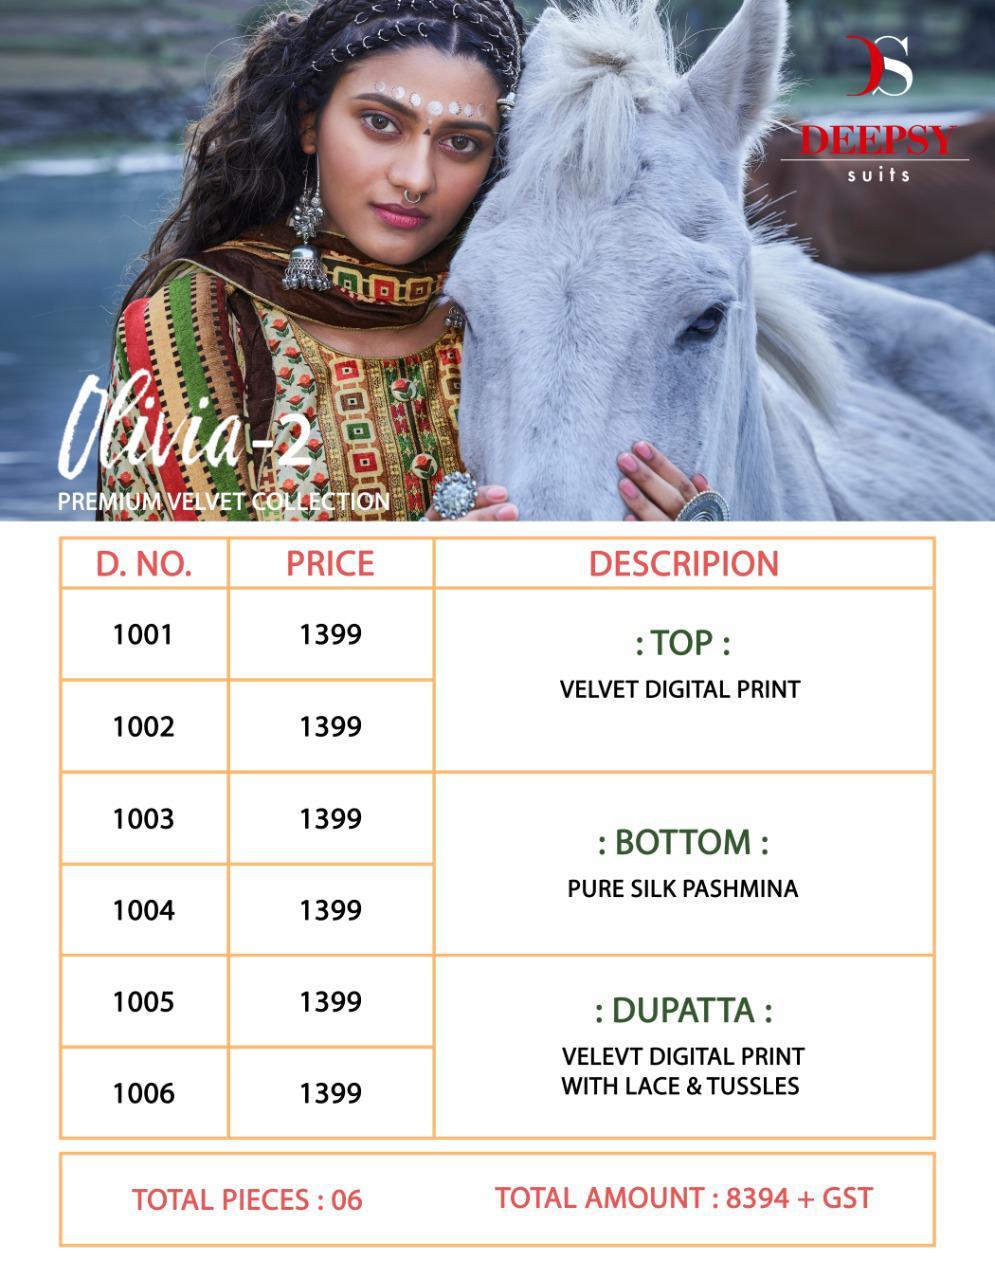 Deepsy Olivia Vol 2 Premium Velvet Collection Salwar Suit Wholesale Catalog 6 Pcs 15 - Deepsy Olivia Vol 2 Premium Velvet Collection Salwar Suit Wholesale Catalog 6 Pcs